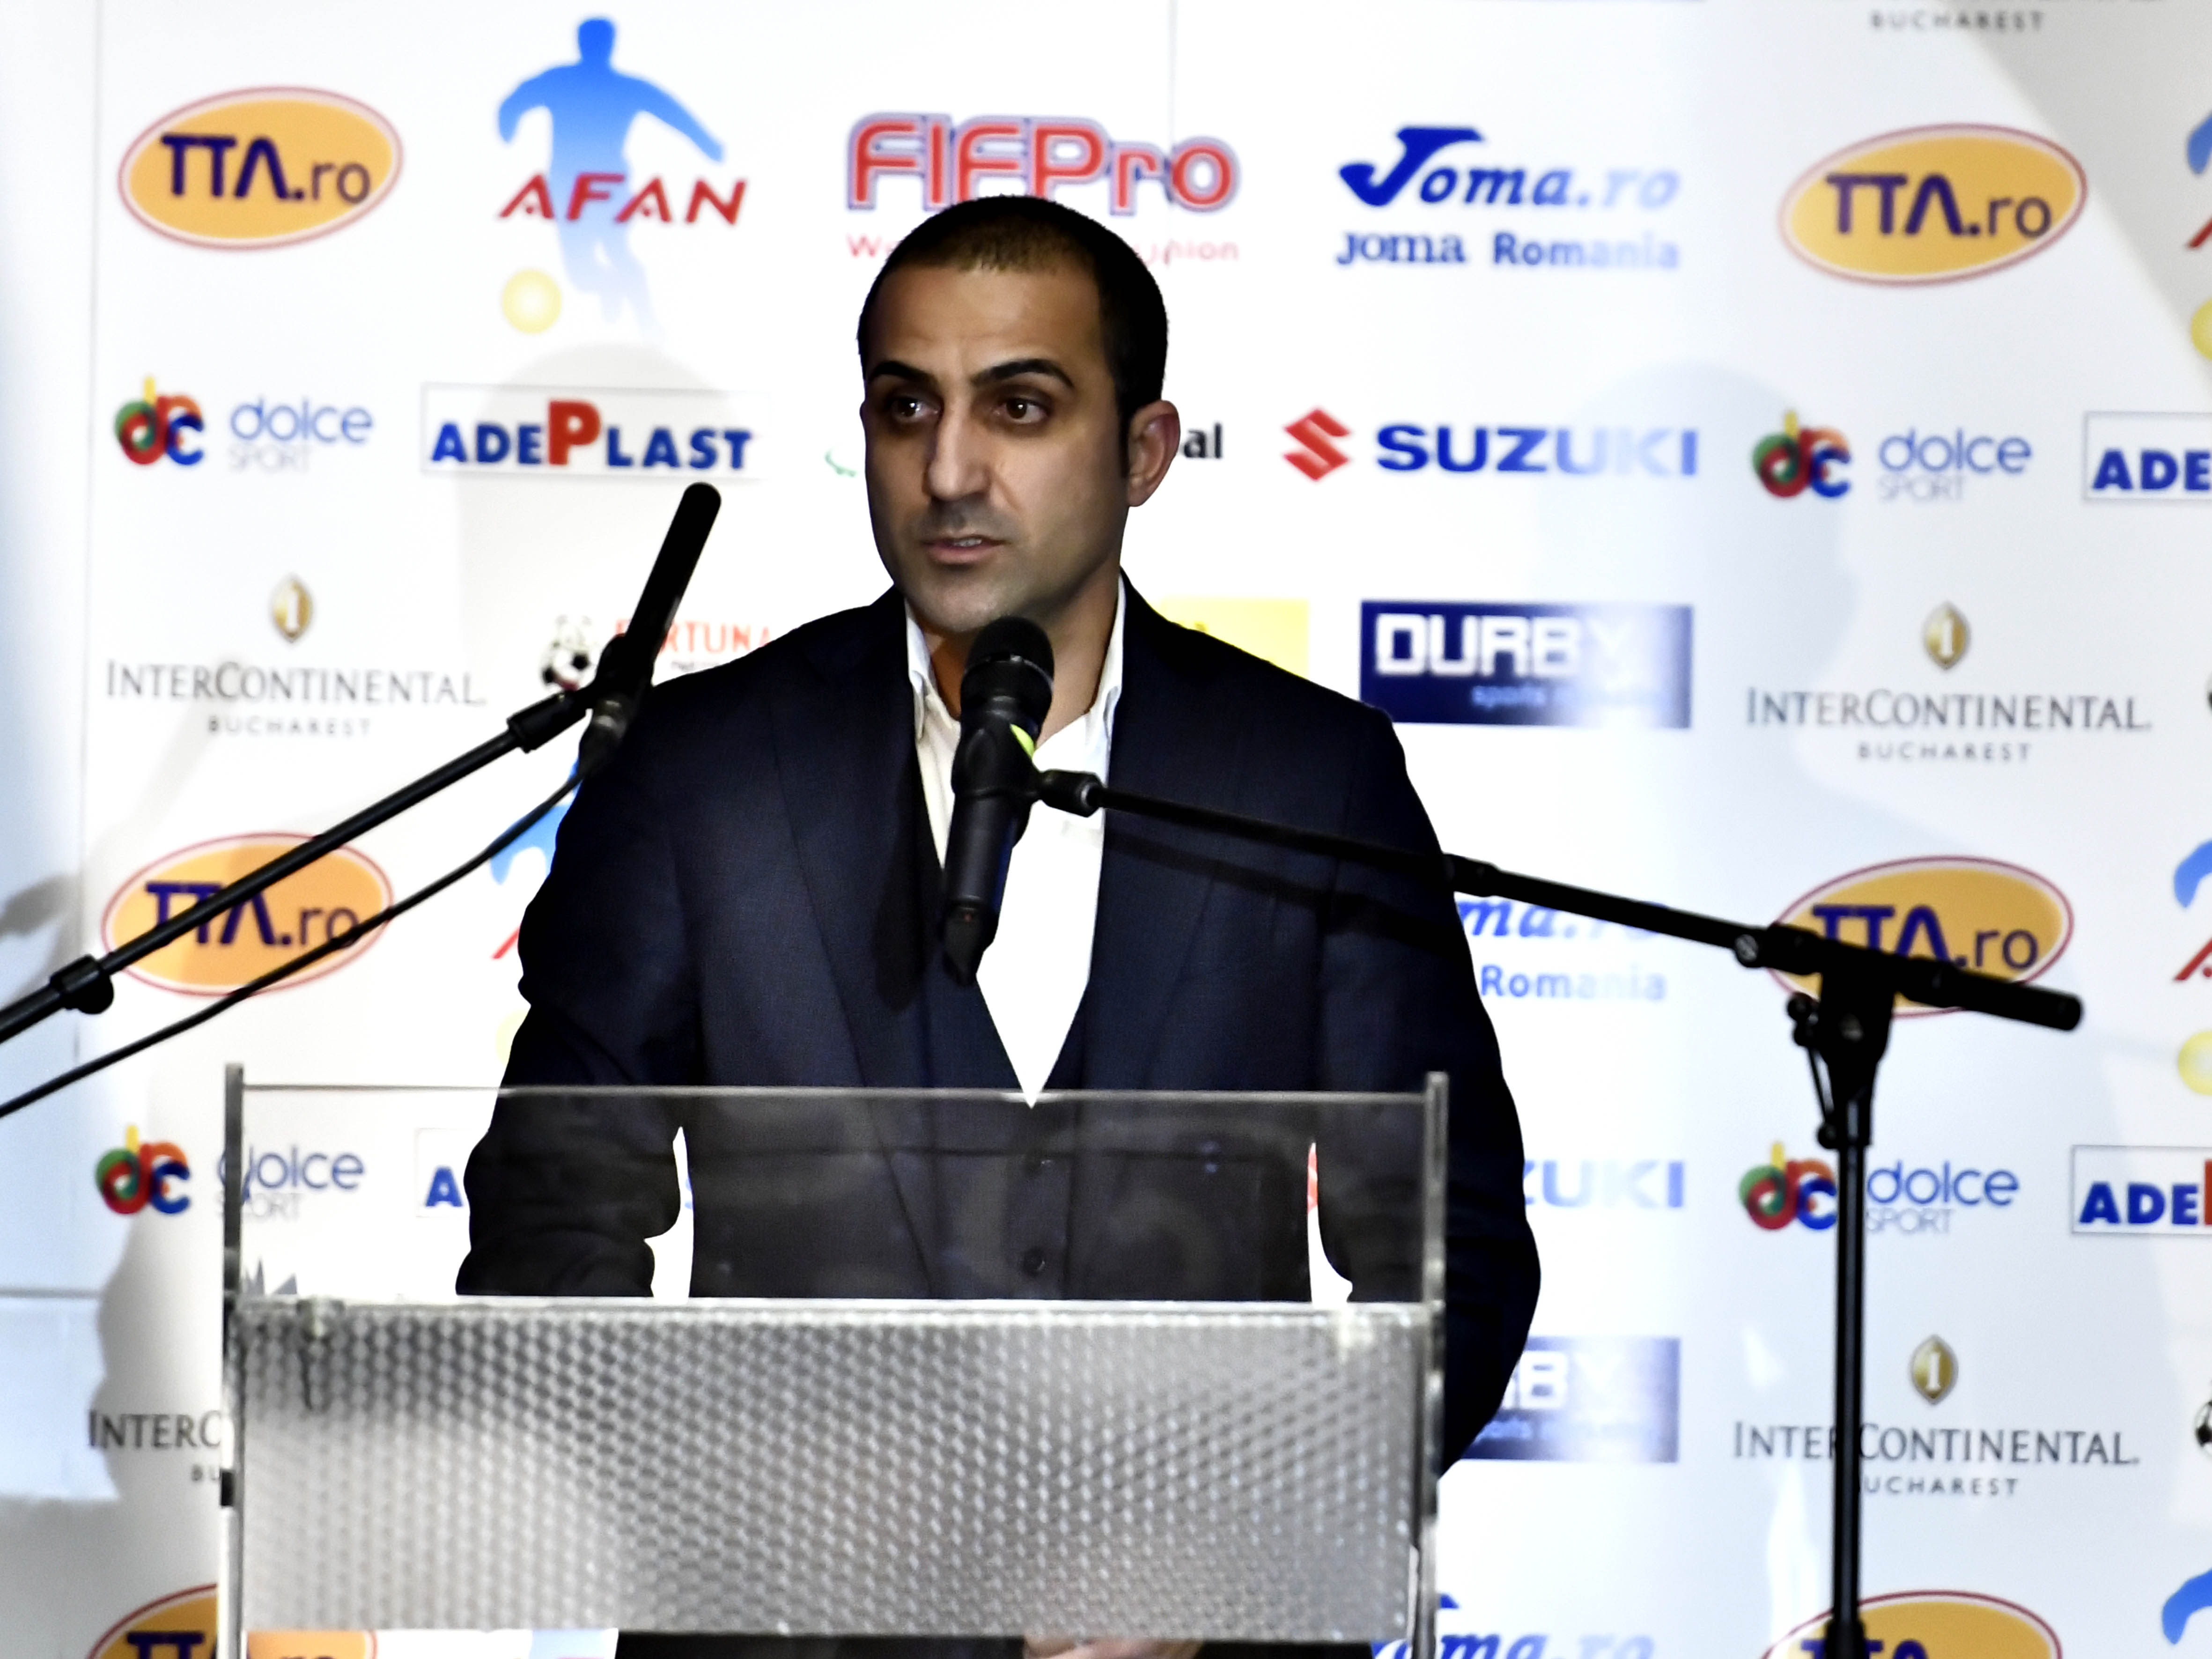 A fost blat la Steaua - Rapid în Cupa UEFA Marin și Tamaș